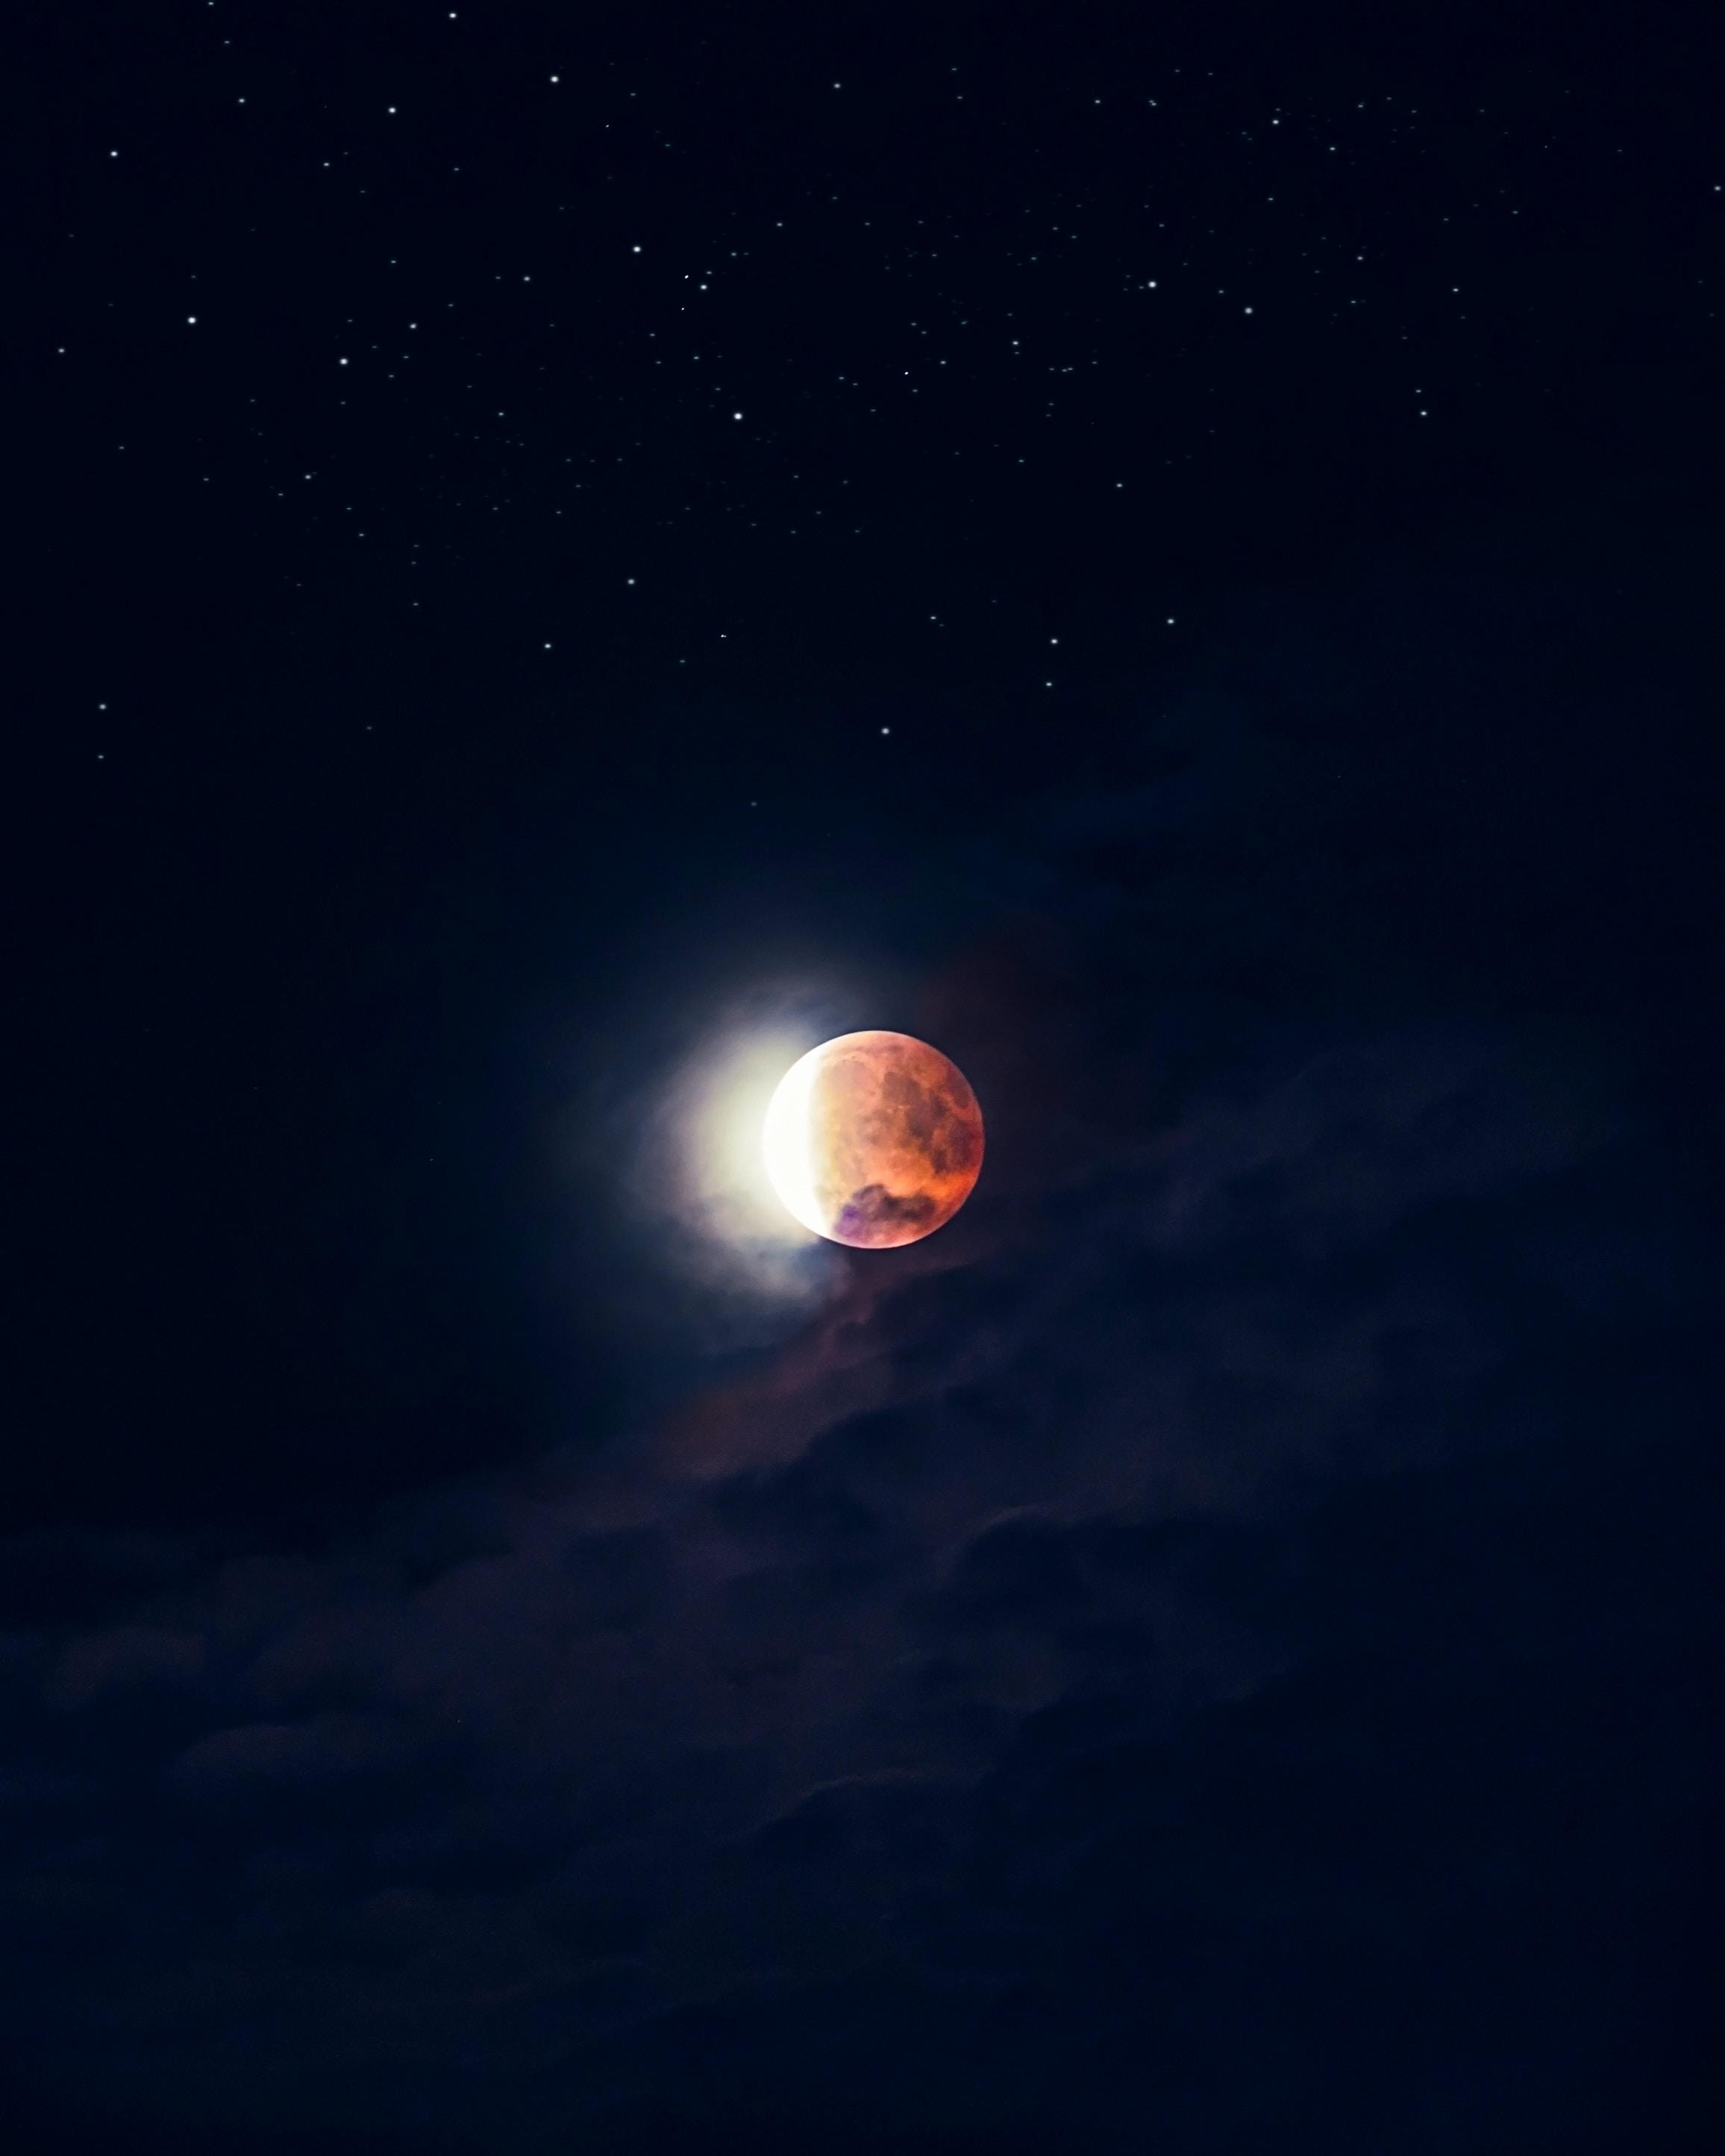 Marvelous Lunar Eclipse Digital Wallpaper